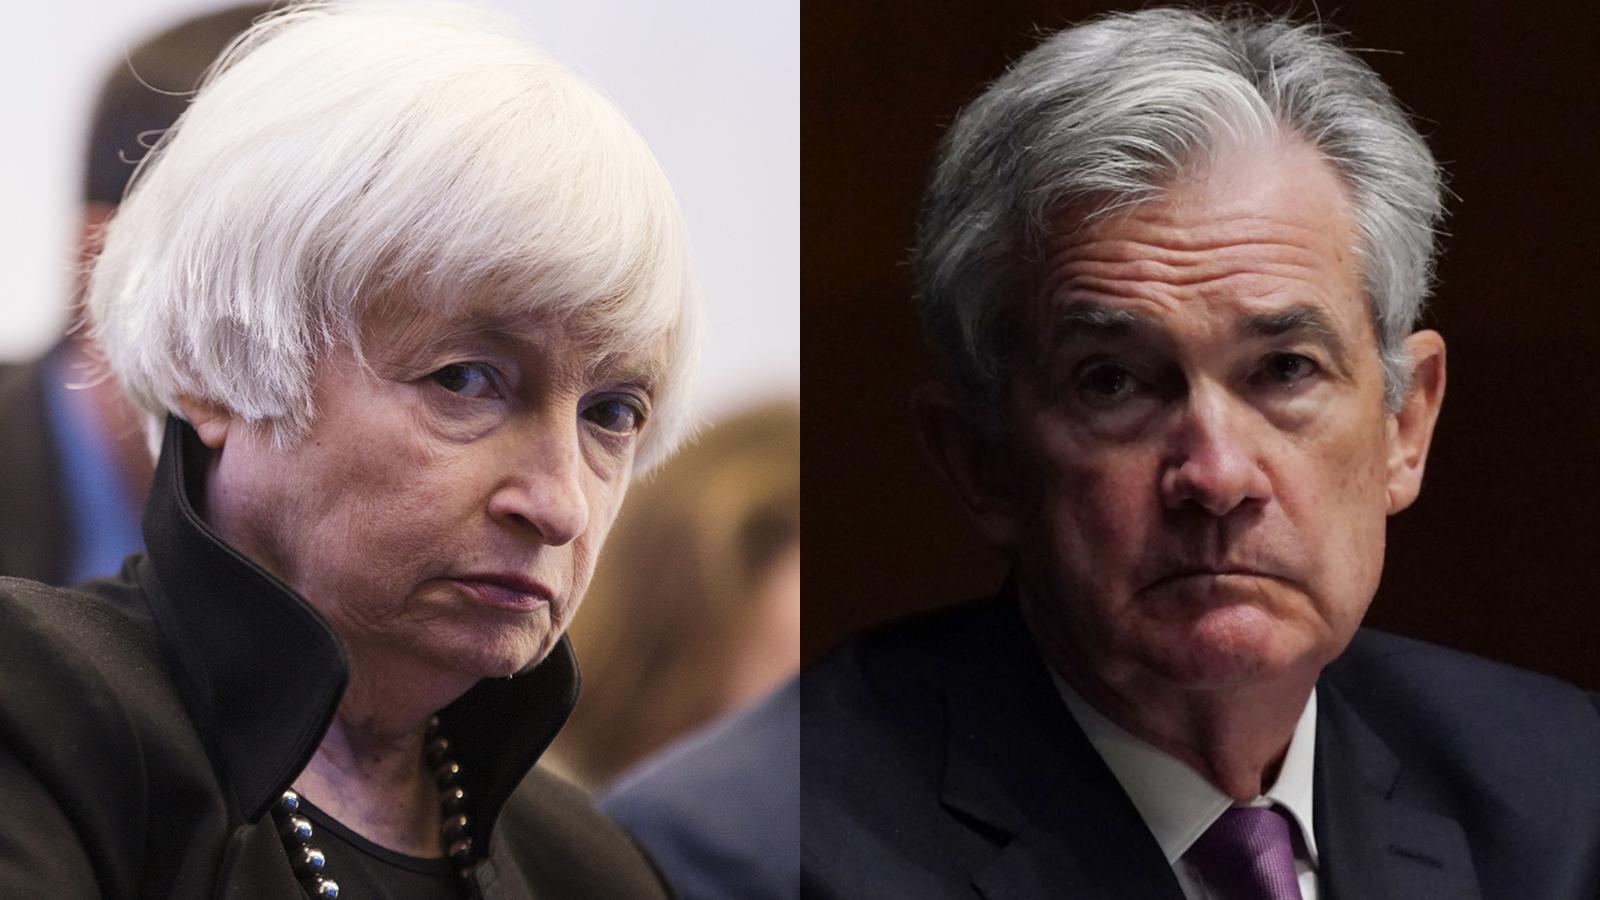 Yellen at Treasury could resuscitate Fed's loan programs | American Banker